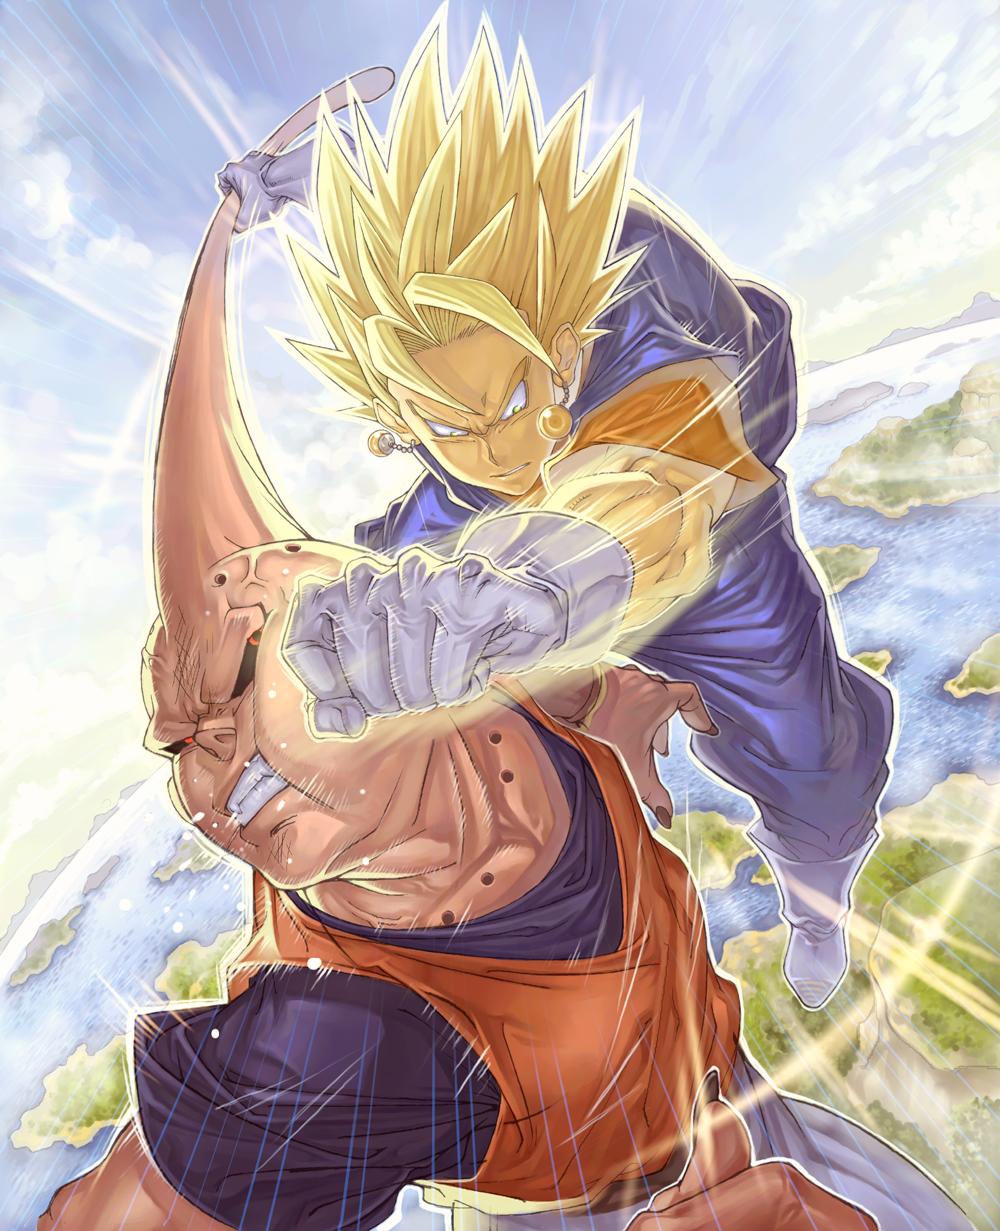 Vegito Dragon Ball Zerochan Anime Image Board